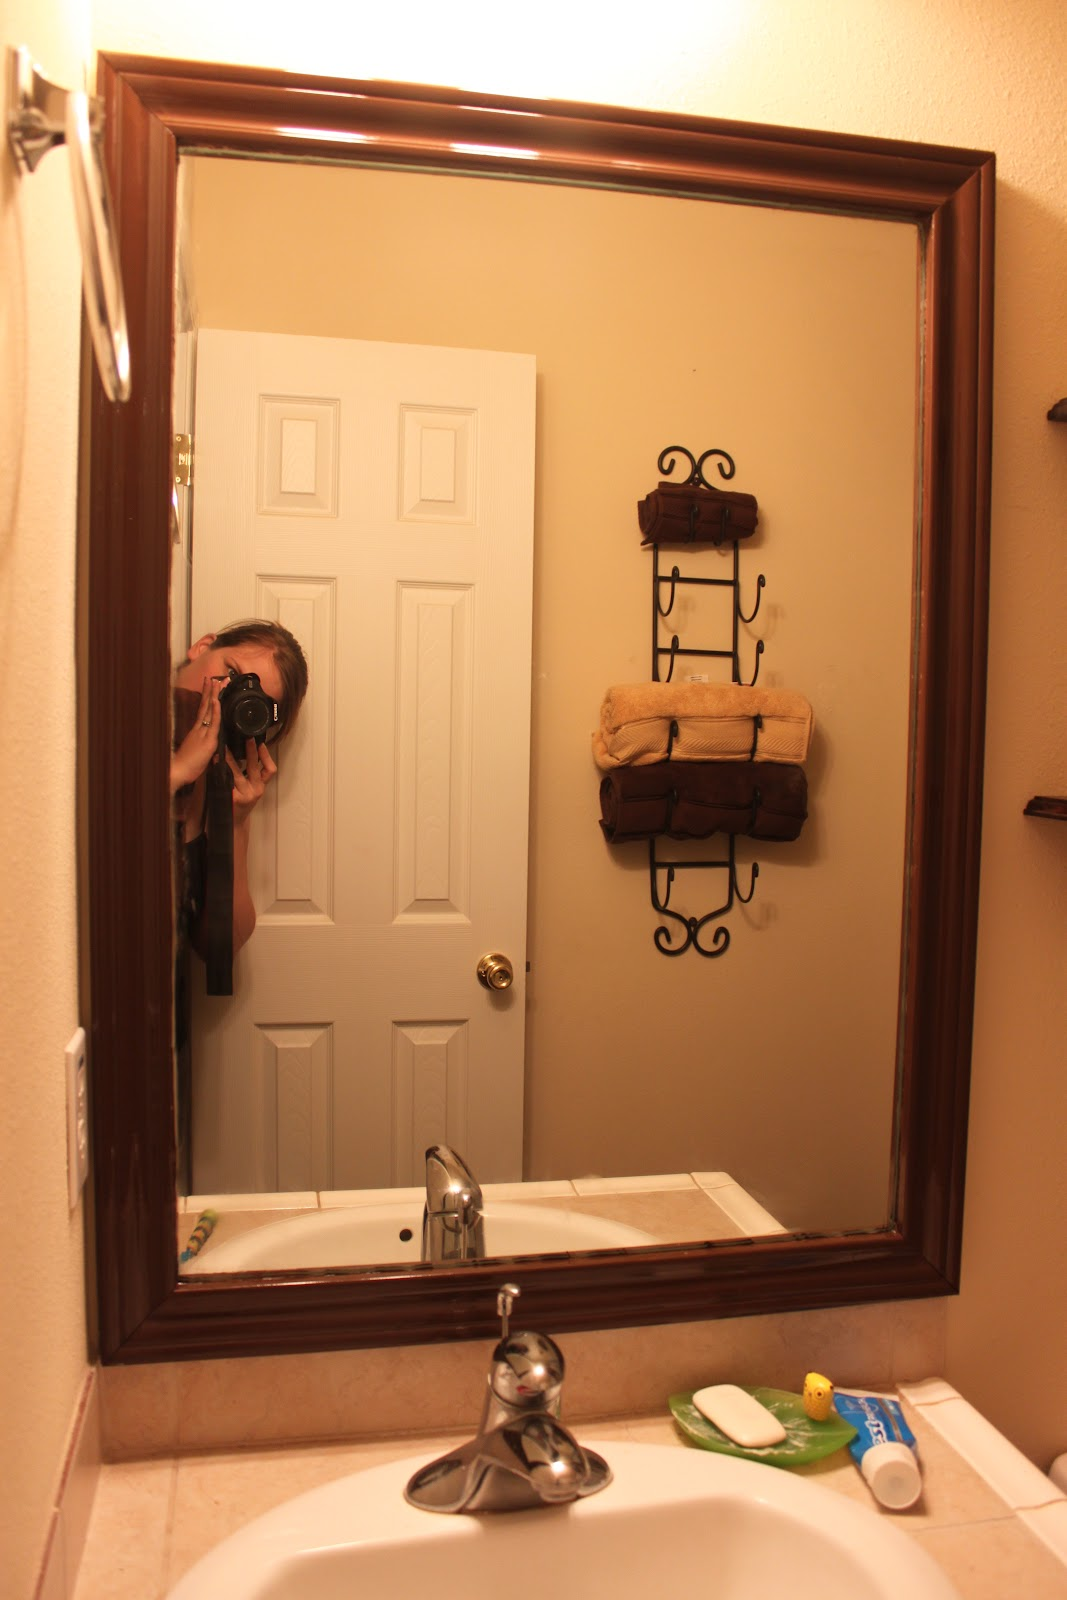 Framed Bathroom Mirrors Ideas: Moments Of Sanity In My Madhouse: Bathroom Mirror Frame